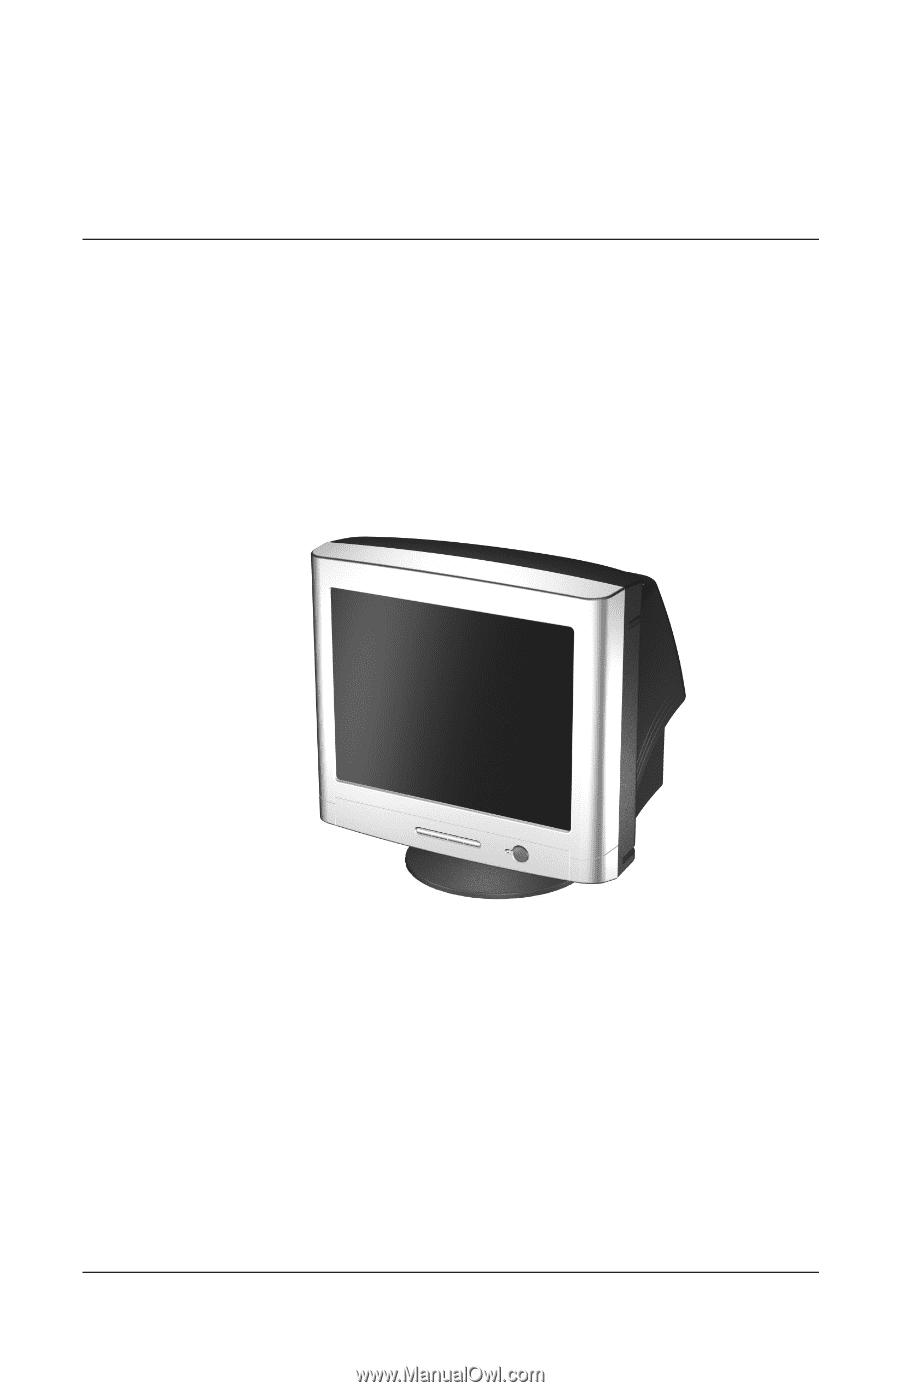 Mnl-8282] compaq professional monitors 17 inch manuals | 2019.